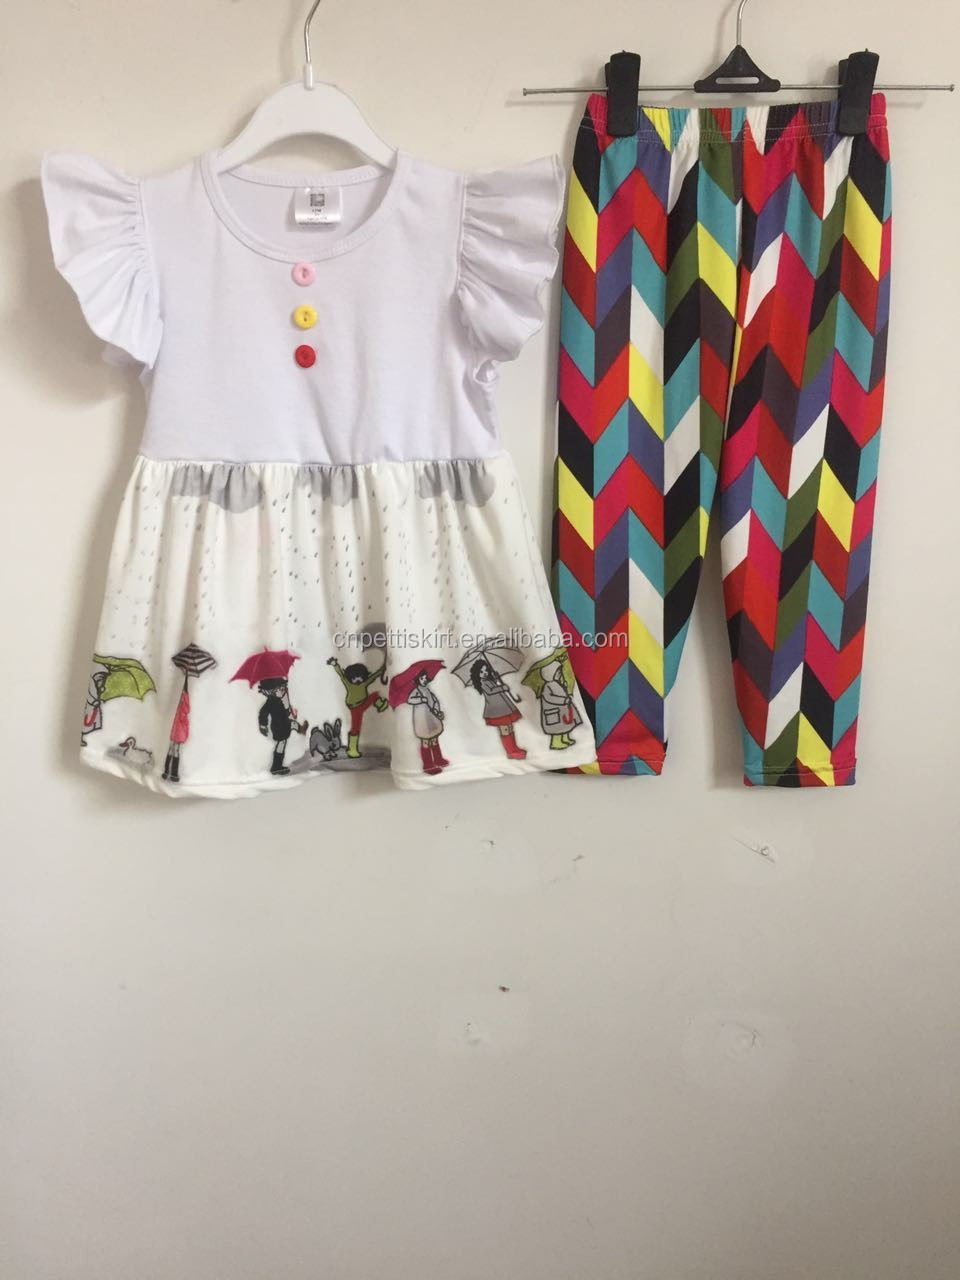 8c9278498 2017 cute little girl boutique remake clothing set fashion troll printing  top matching shorts ruffle girls